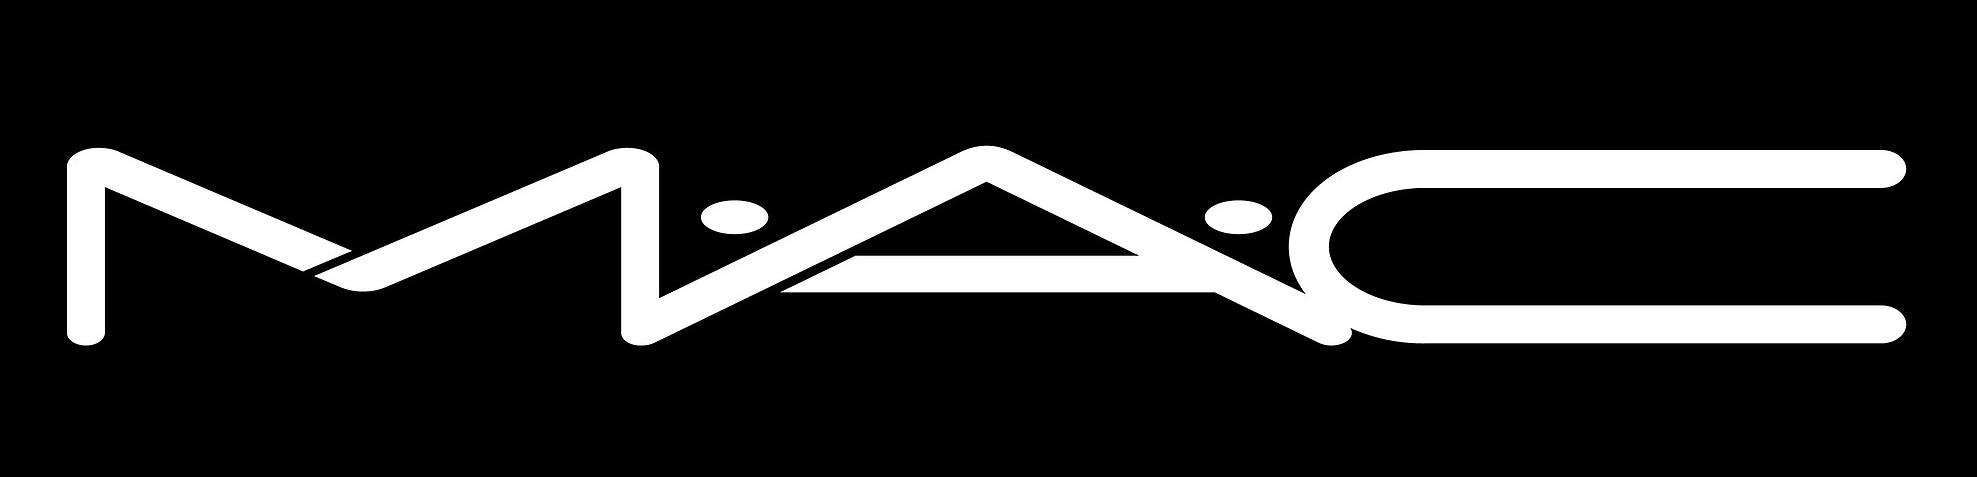 Mac cosmetics logo.